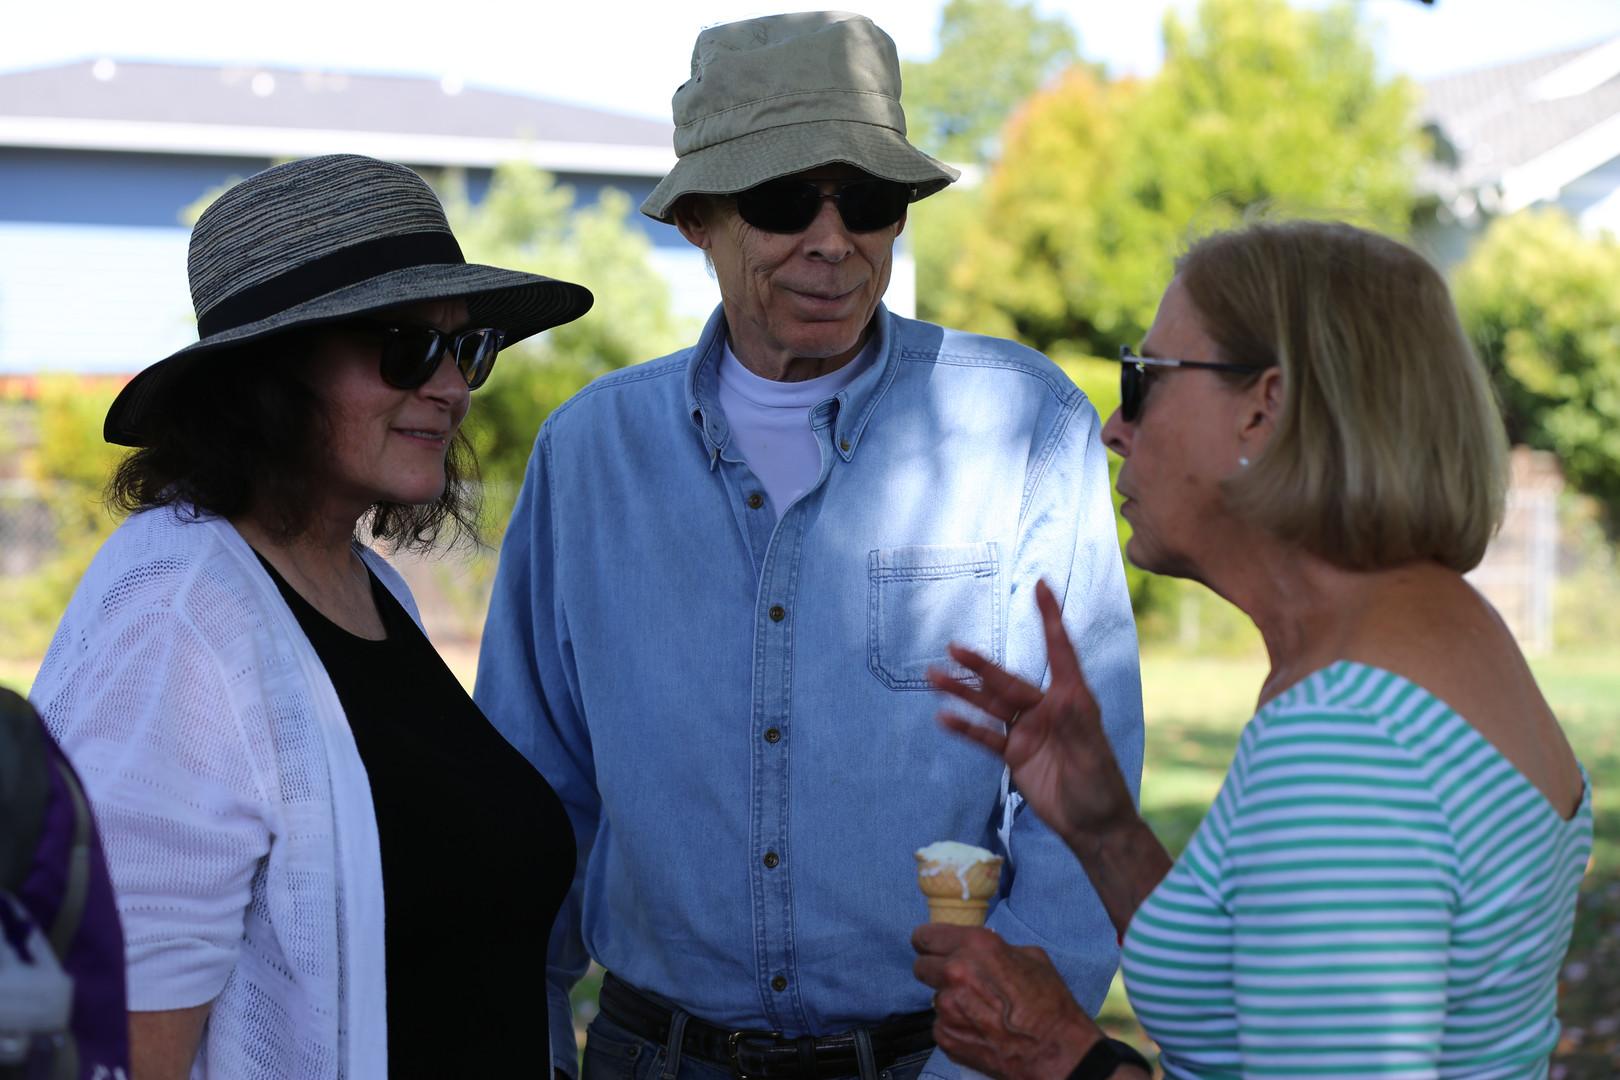 Neighbors gather for Alison Cormack